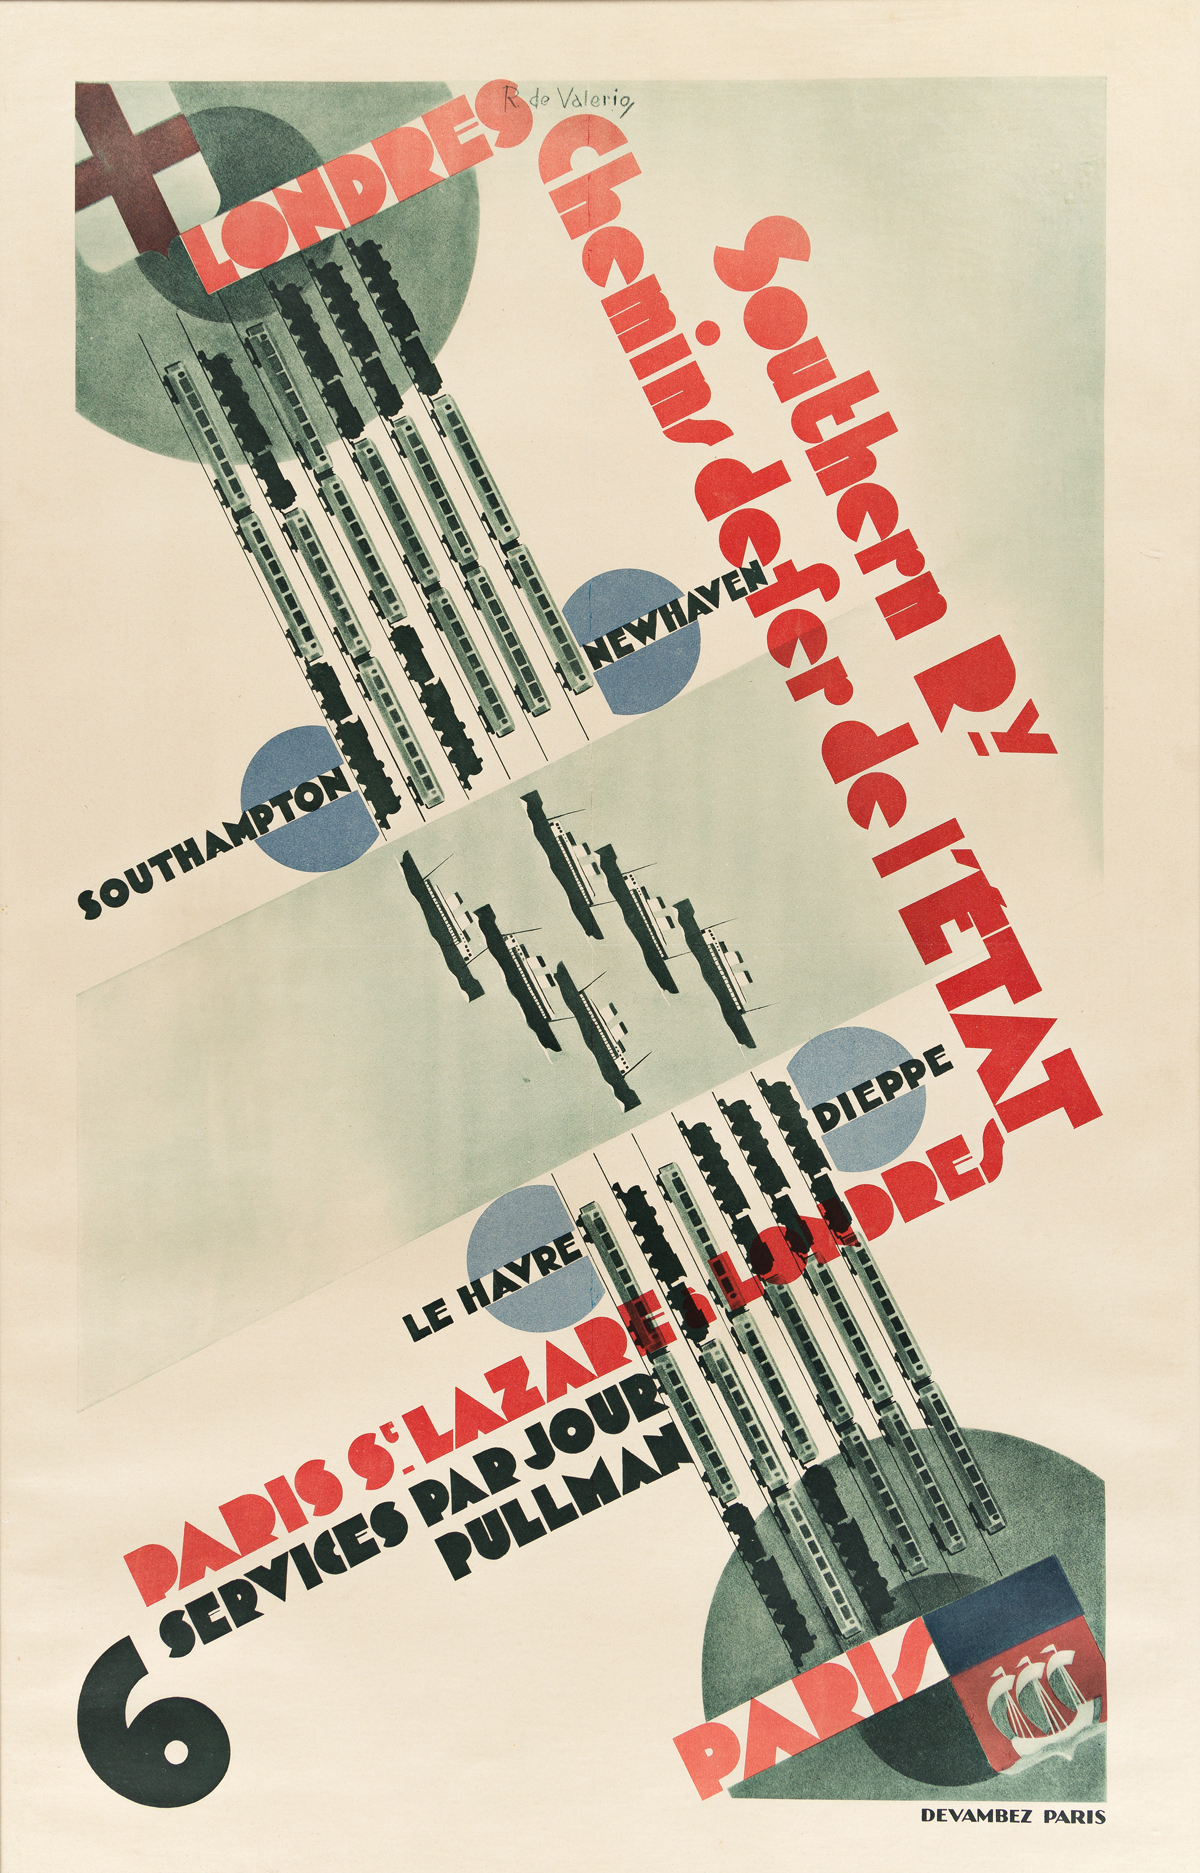 ROGER DE VALÉRIO (1896-1951).  LONDRES / PARIS / SOUTHERN RY CHEMIN DE FER DE LETAT. 41x26 inches, 104¼x66 cm. Devambez, Paris.